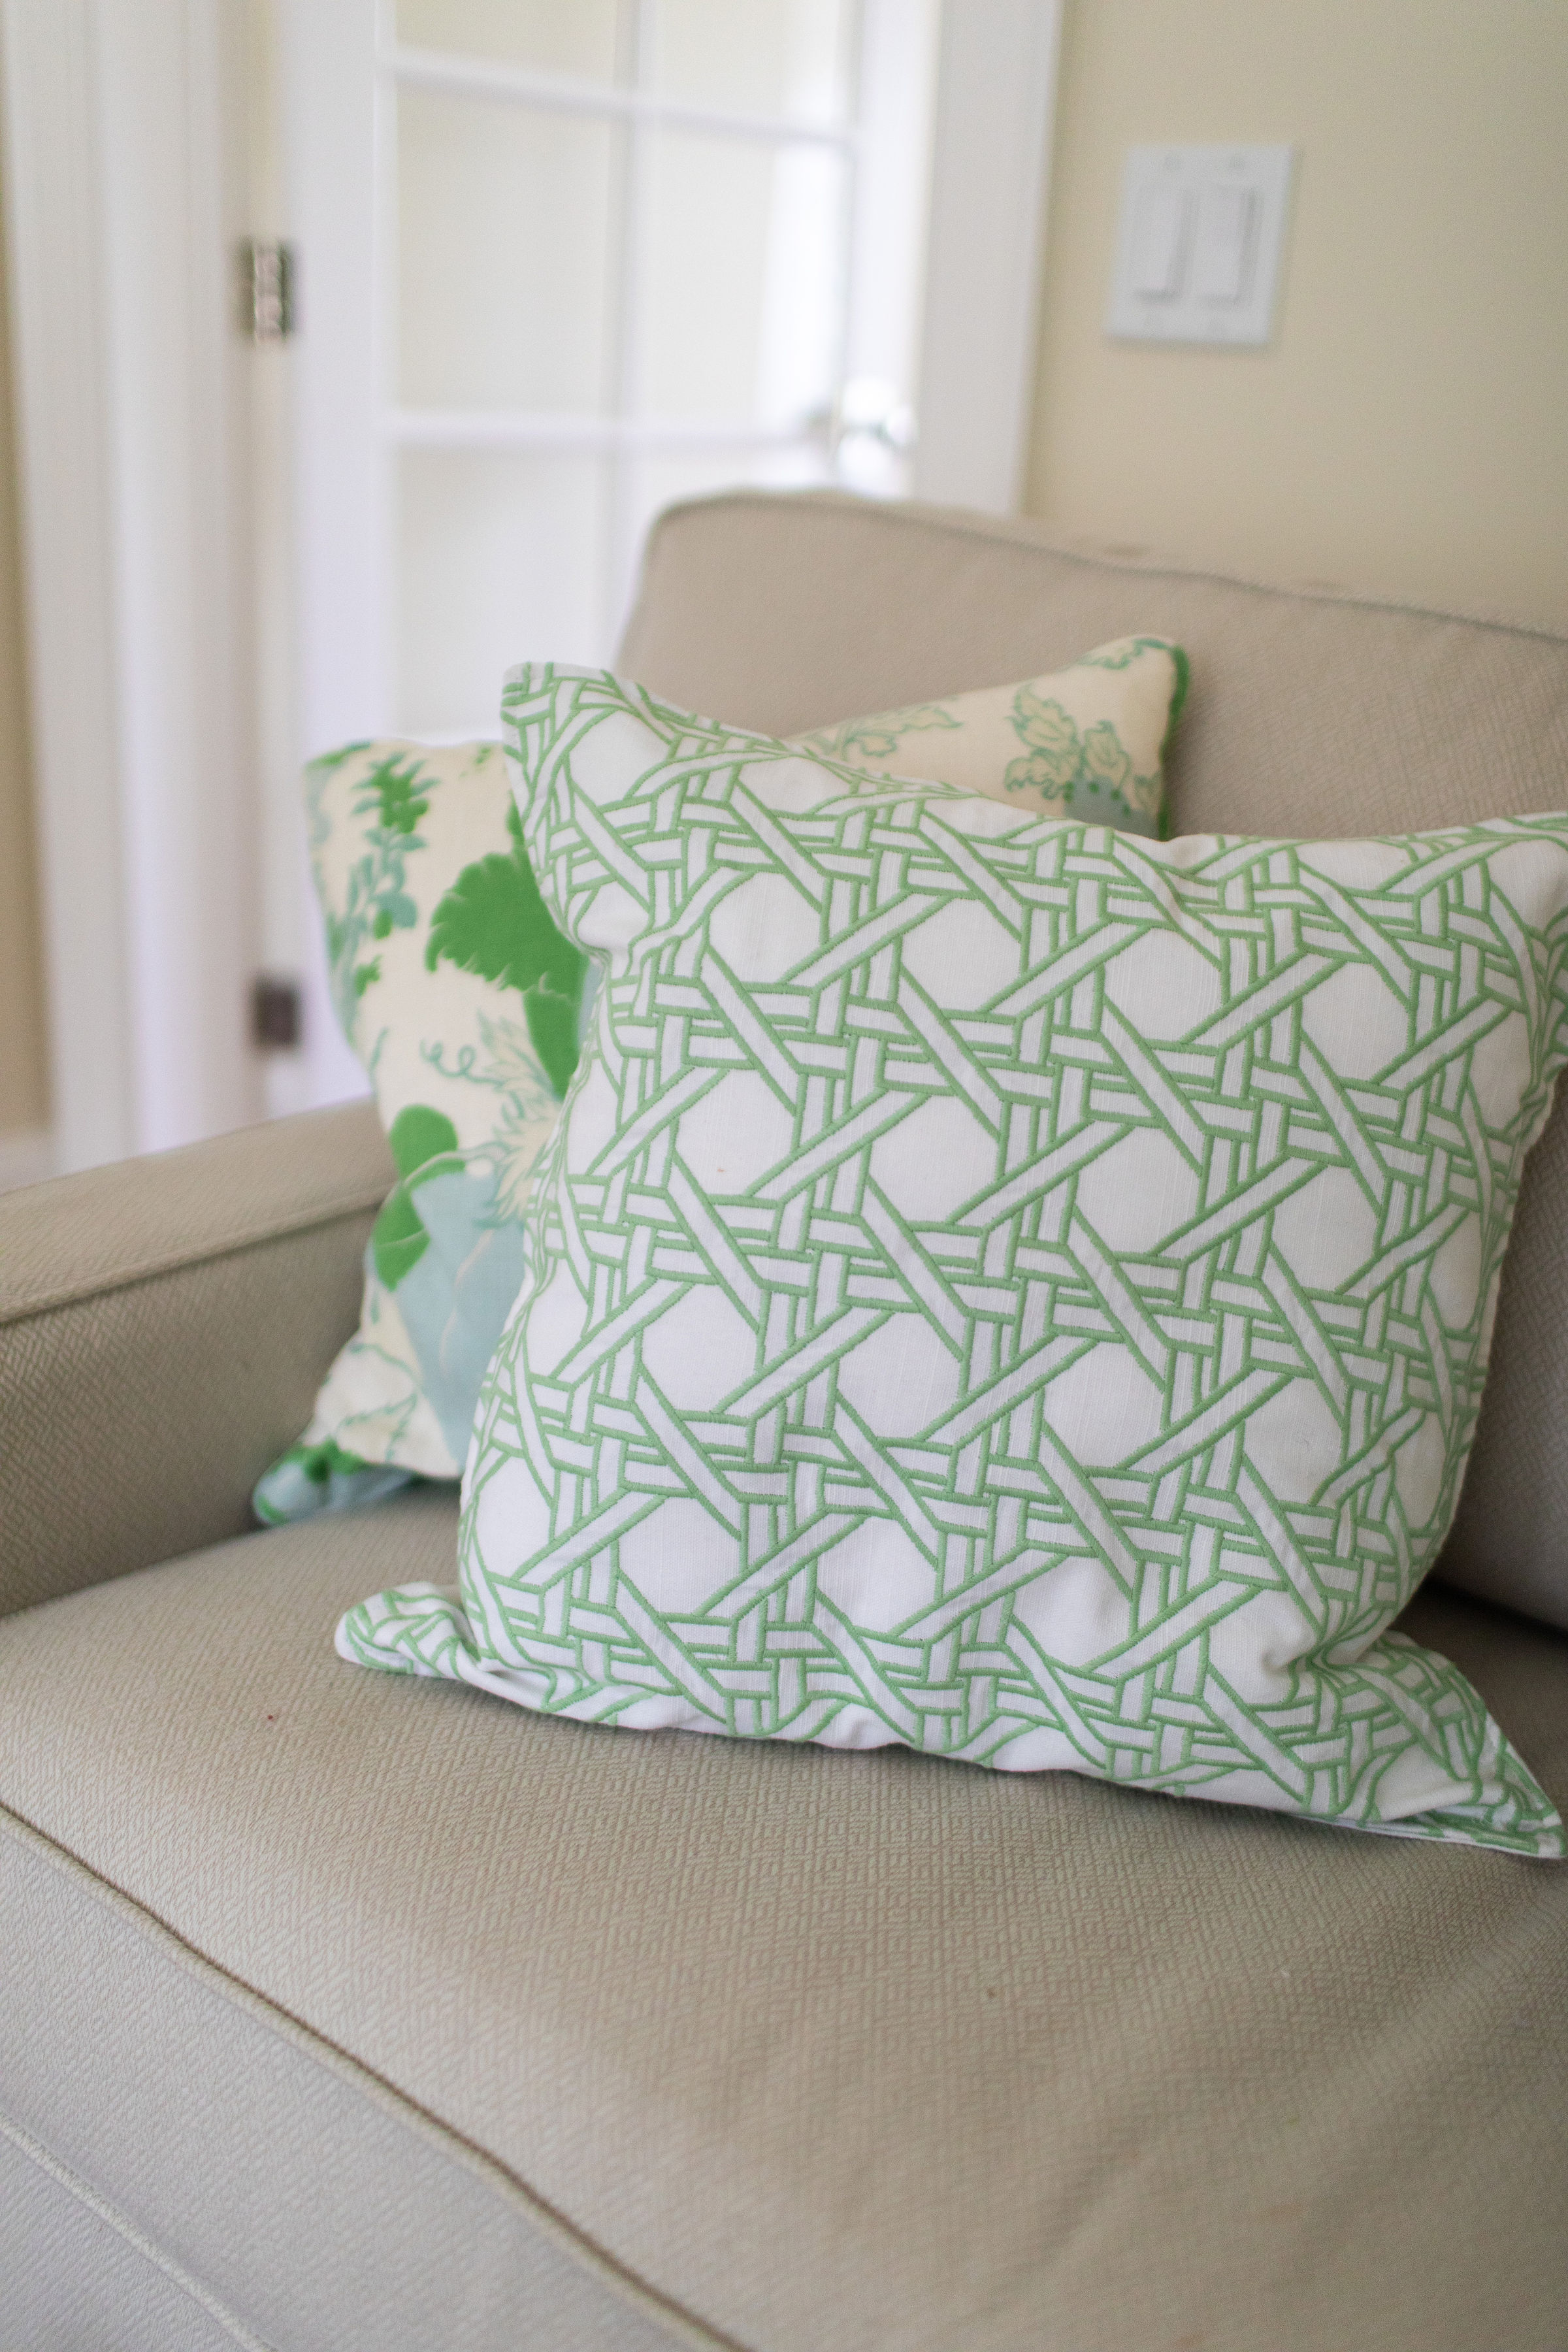 Cottage interior design style sofa, Teaselwood Design, Skaneateles, NY interior designer